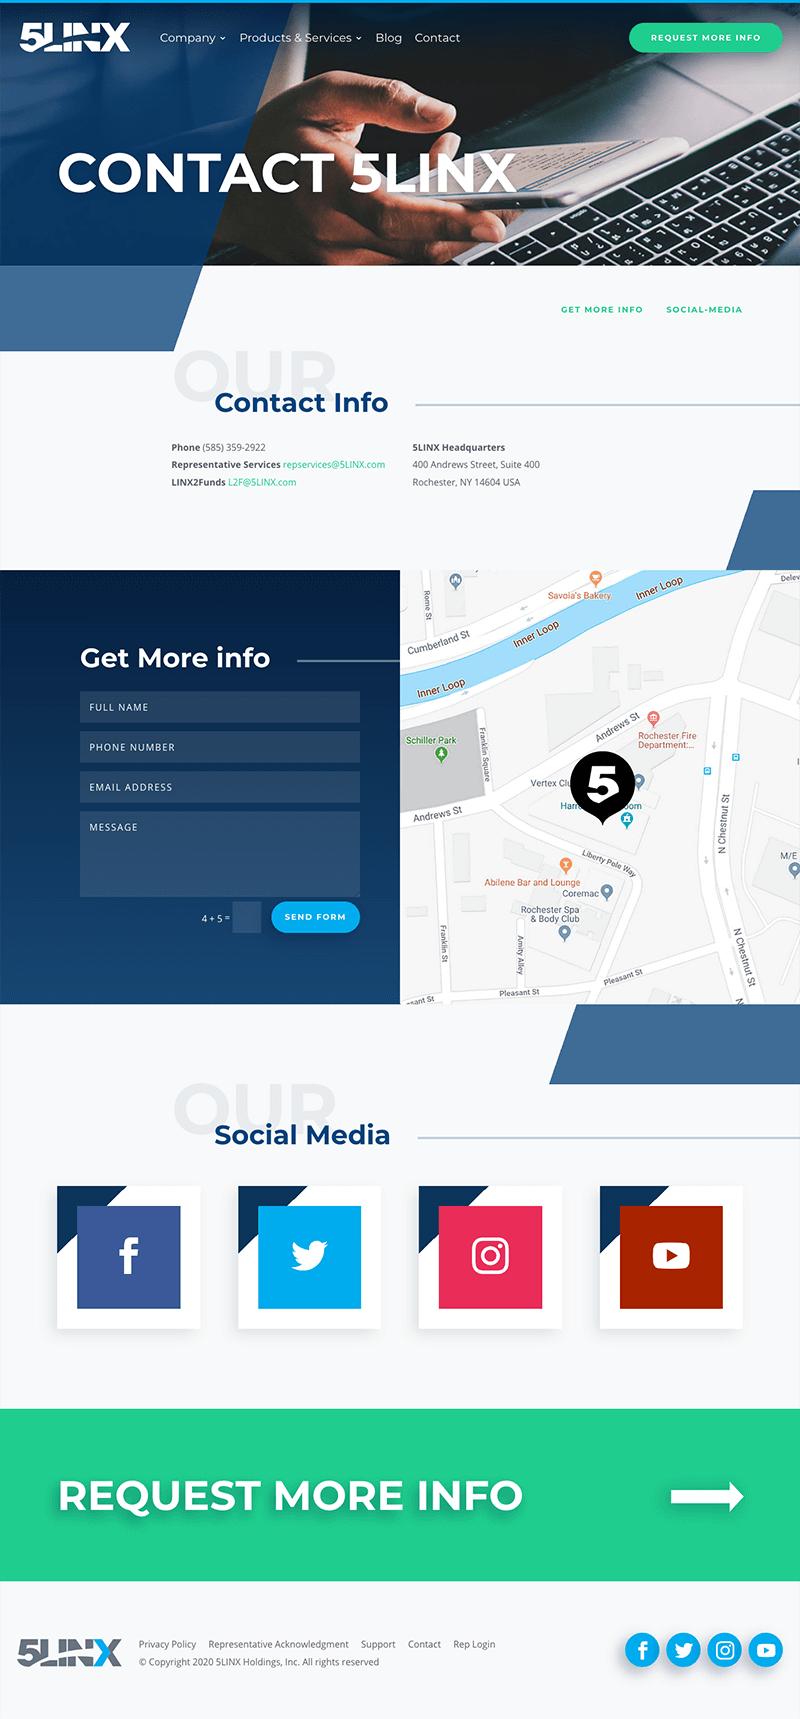 5LINX Web Design